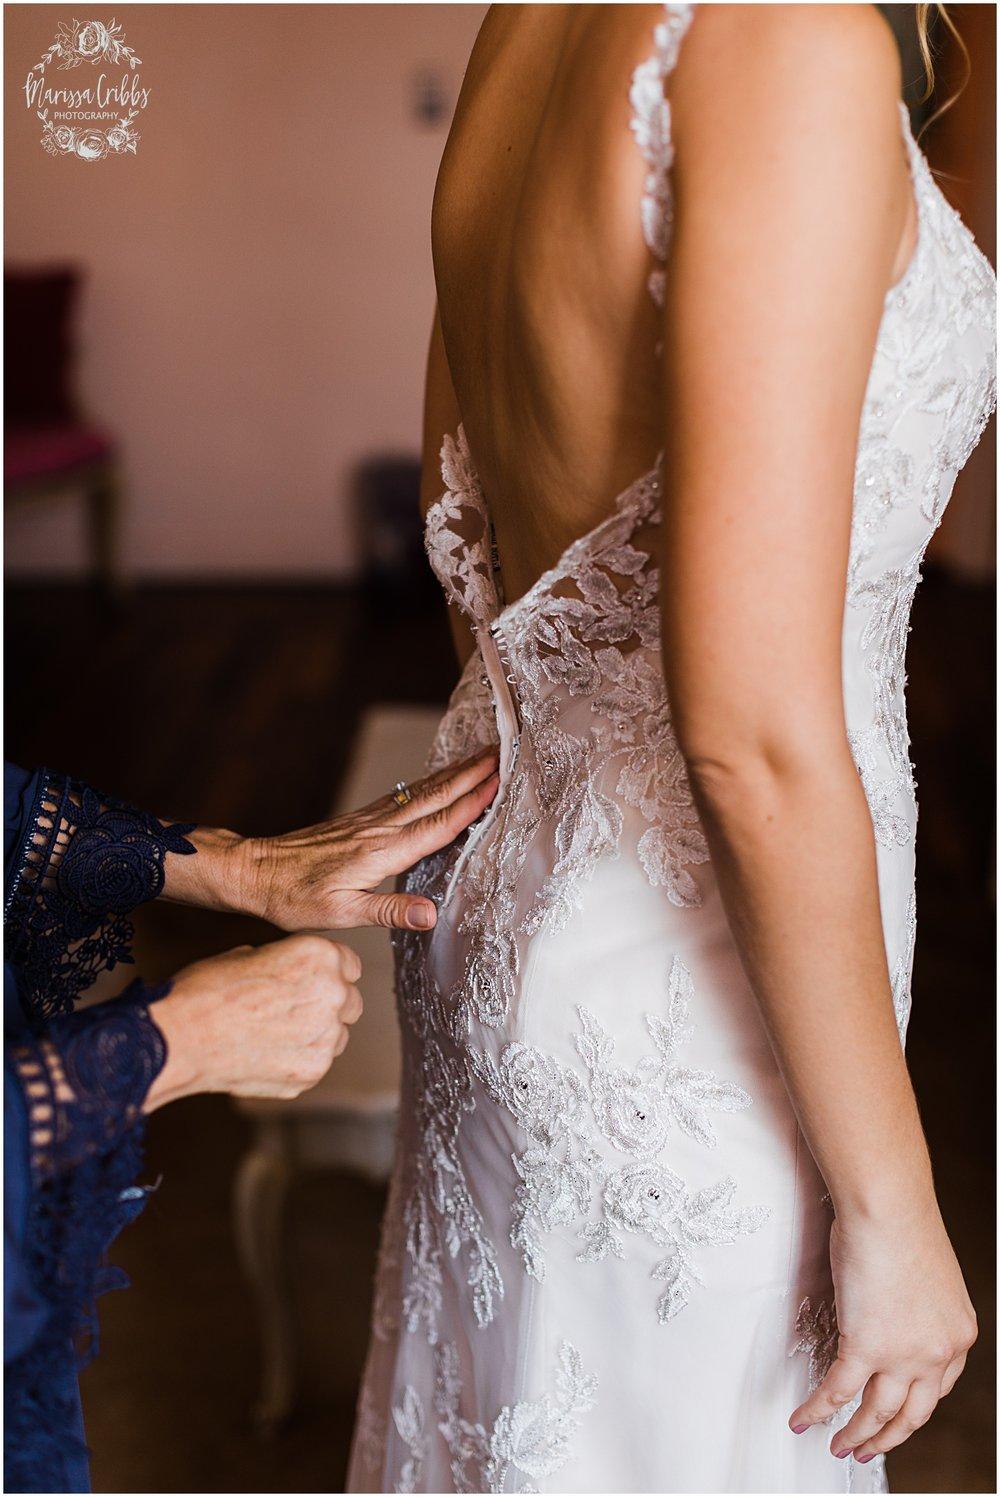 BAUER WEDDING | KELSEA & JUSTIN | MARISSA CRIBBS PHOTOGRAPHY_6491.jpg